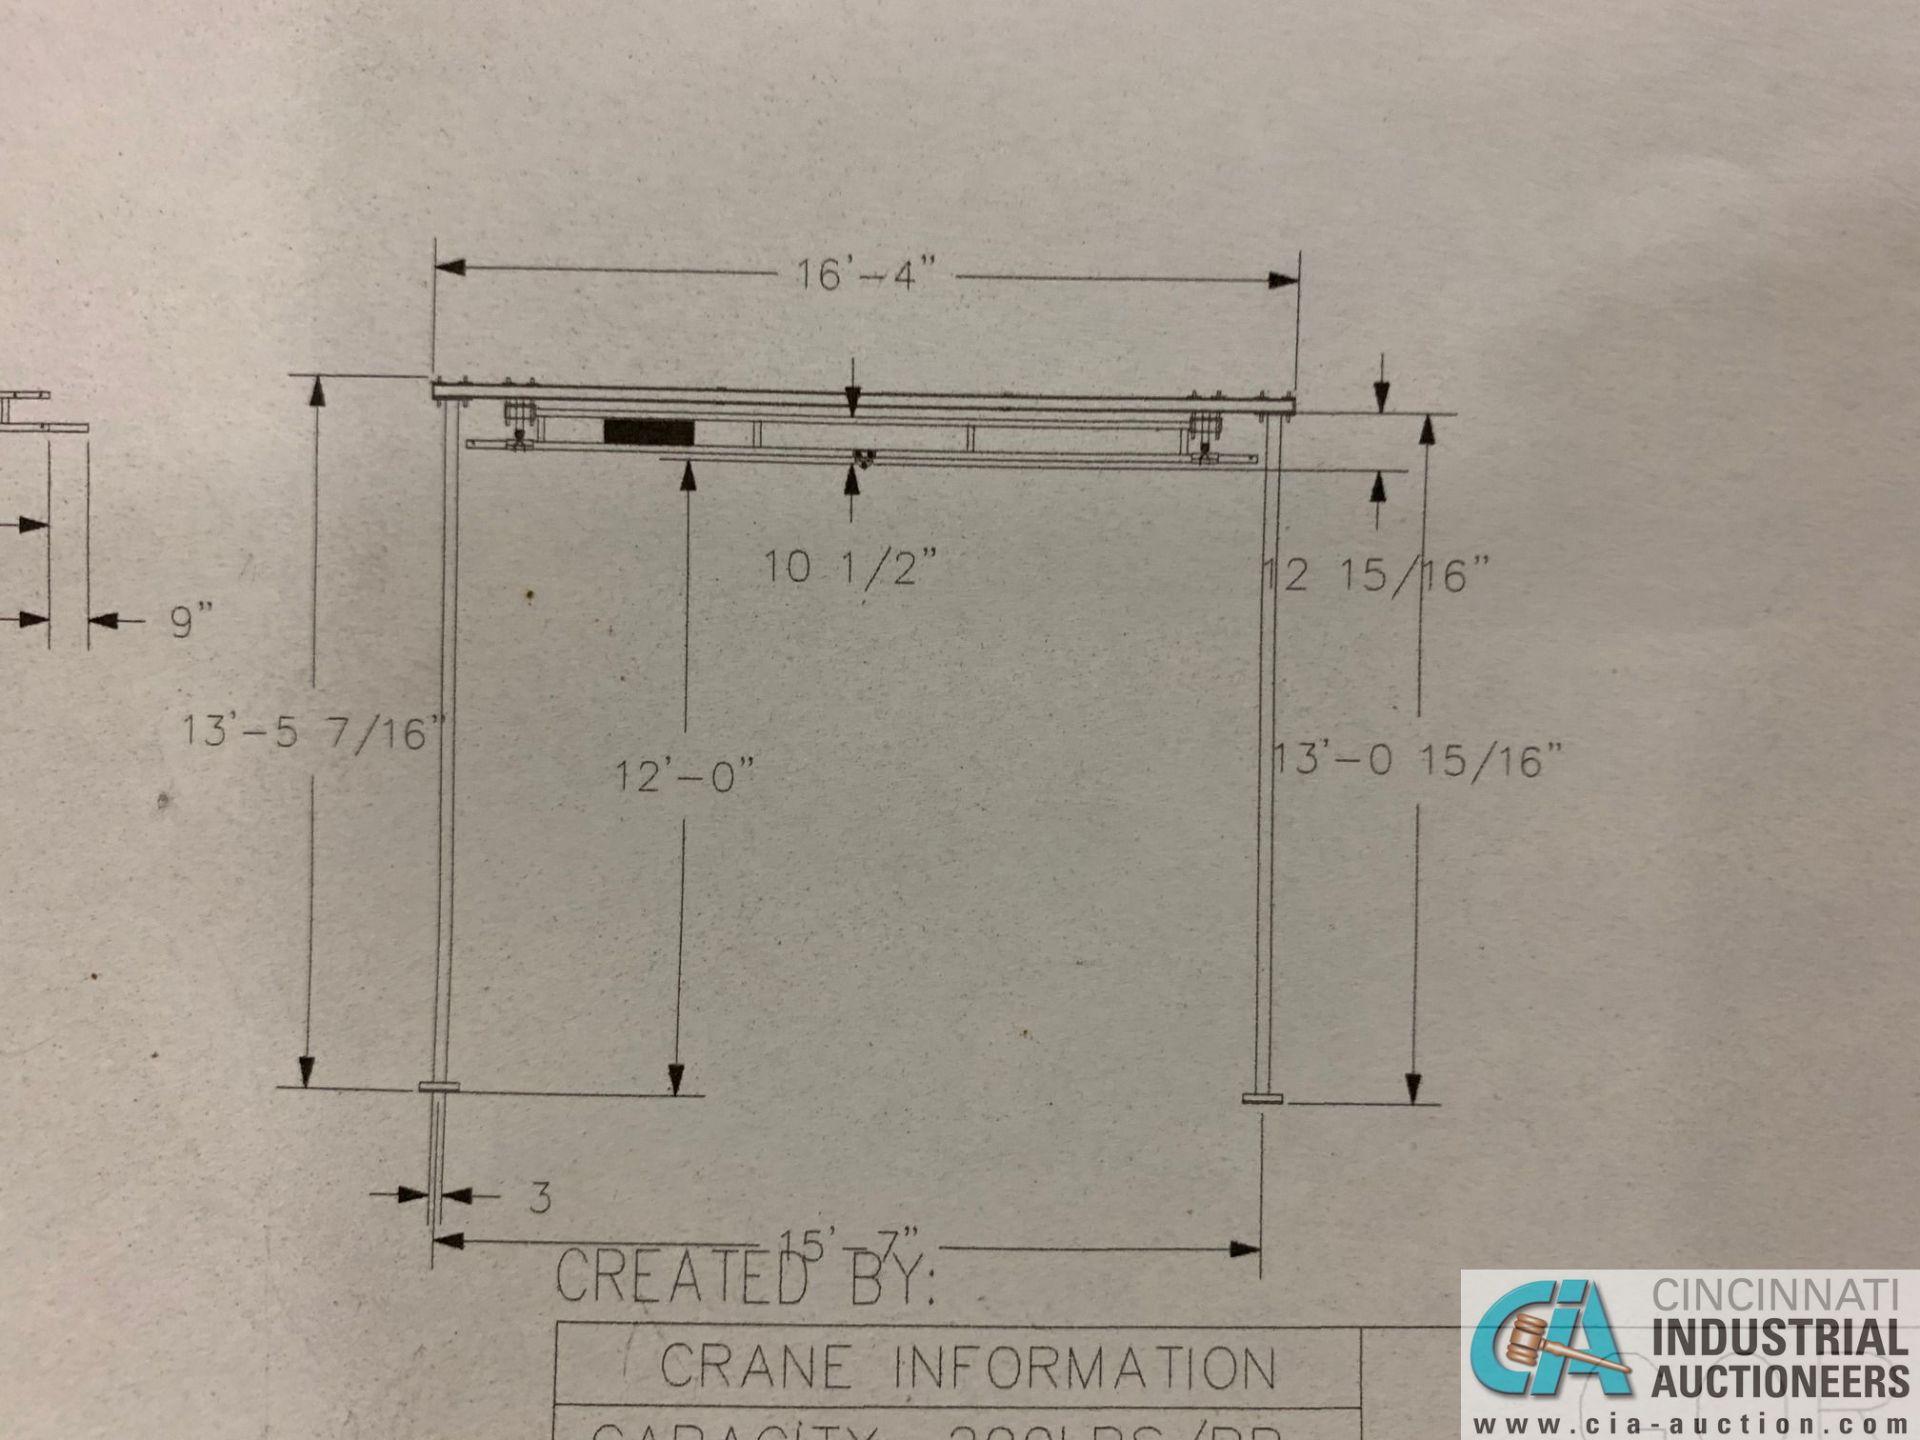 200 LB. GORBEL MODEL GLCS-FS-250-15-15-12 FREE-STANDING CRANE SYSTEM; 15' BRIDGE OAL, 15' RUNWAY - Image 11 of 15